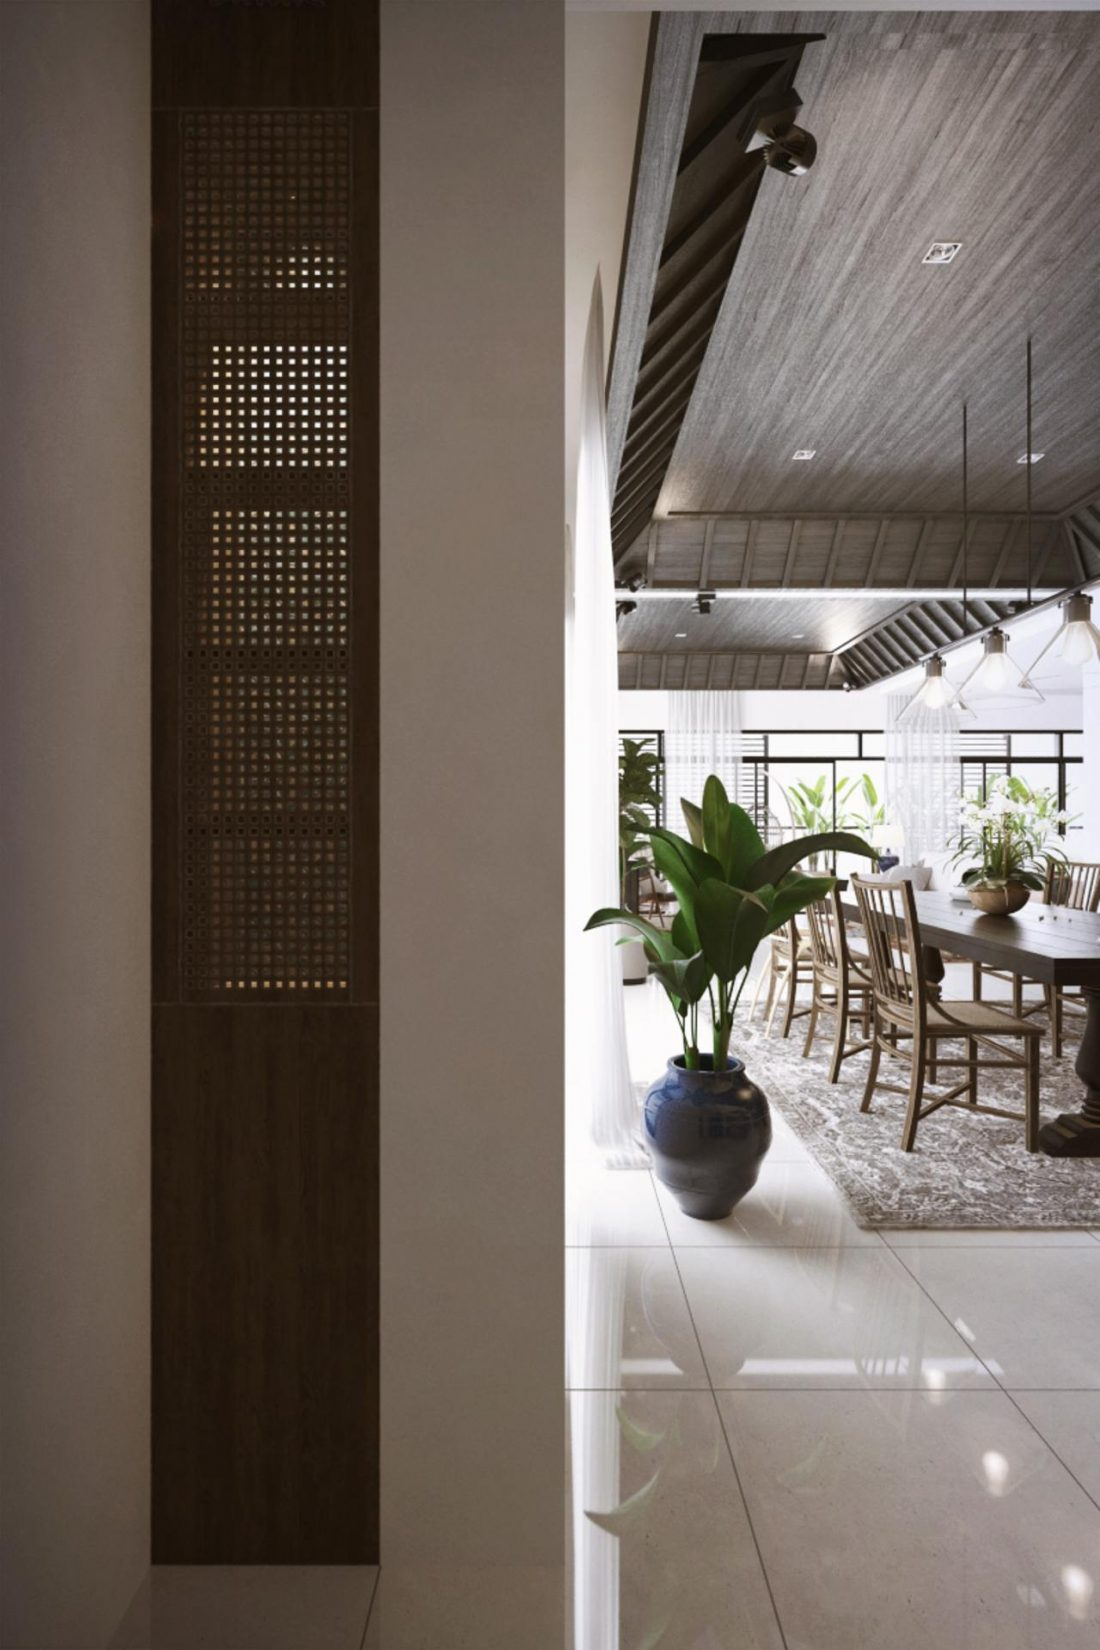 Interior Design The Light Collection III Penang Malaysia Foyer Design v1